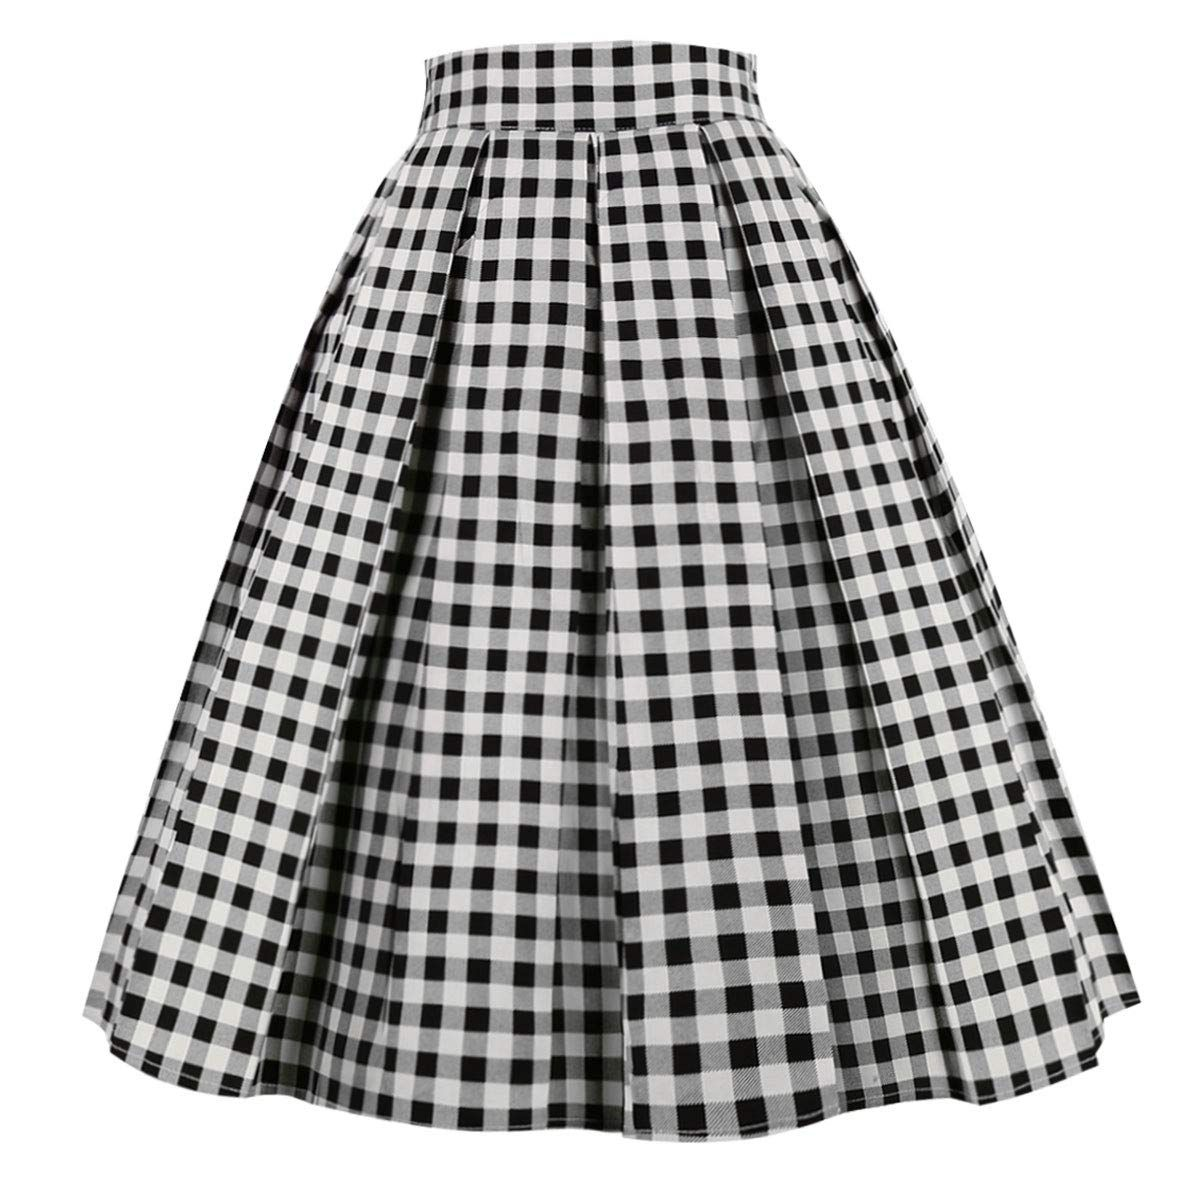 Prepretty Womens 50s Pleated Floral Polka Dots Vintage A-line Printed Flared Pockets Midi Skirt